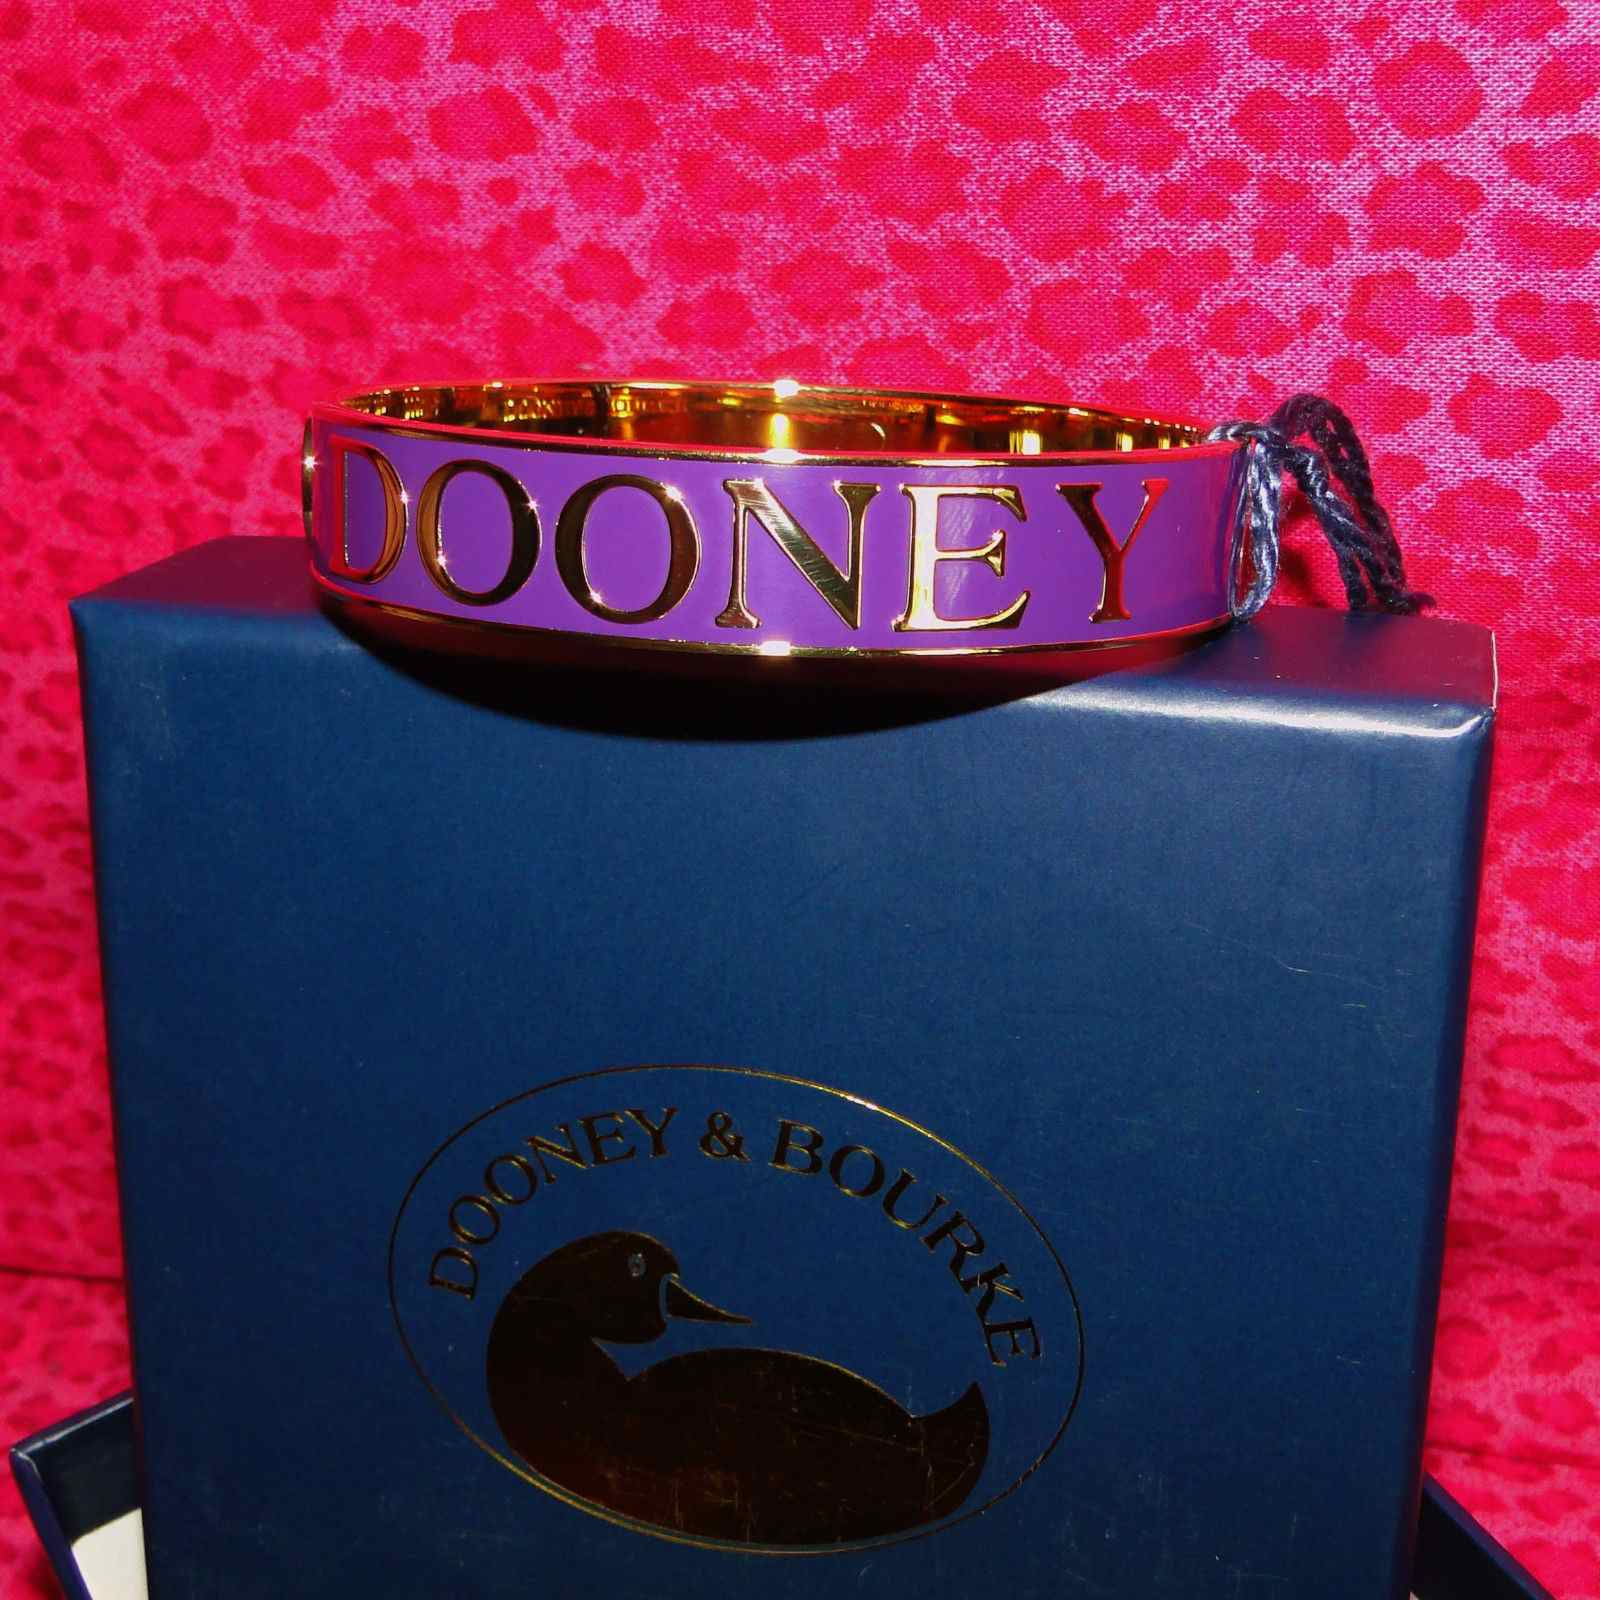 Dooney & Bourke Bangle Bracelet Purple Inlay New & Gift Boxed